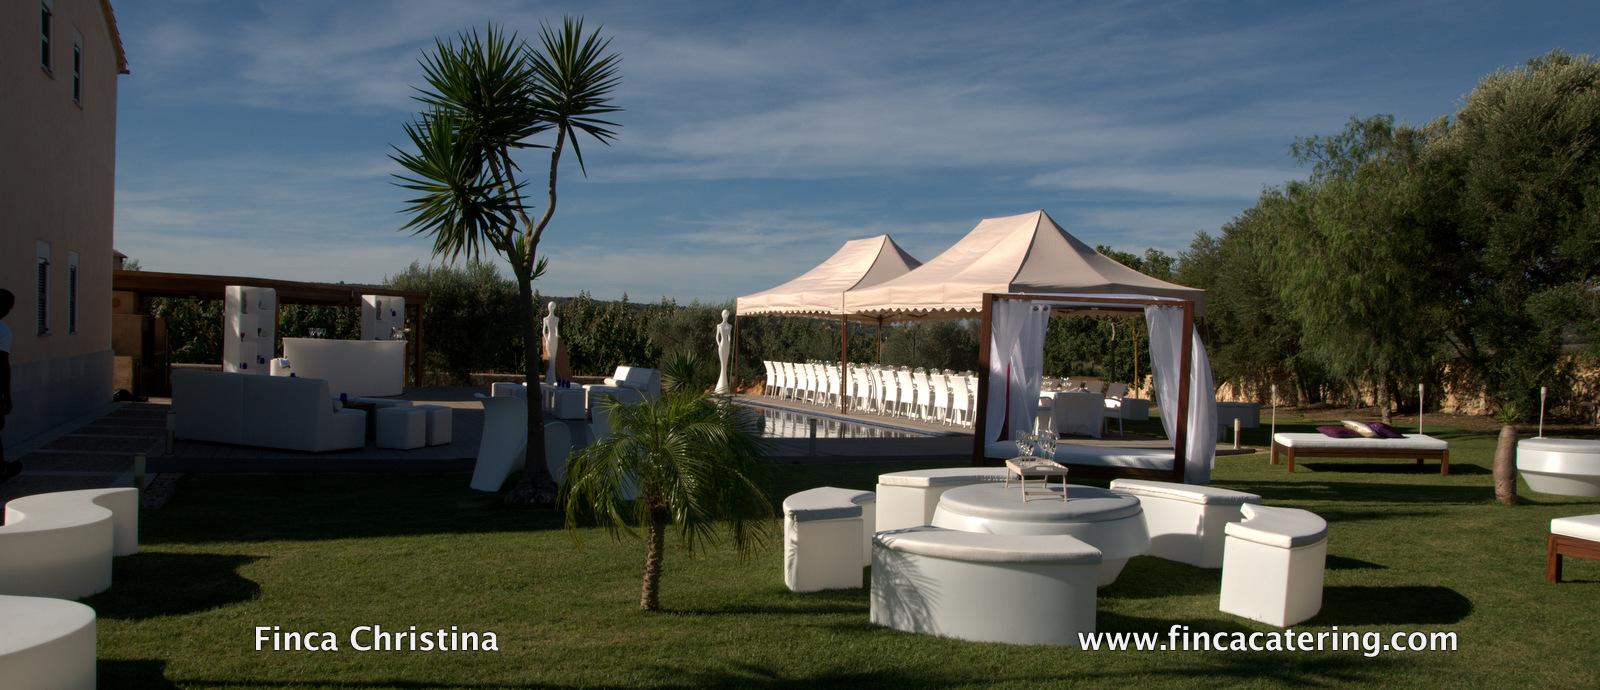 29 Finca Catering 10 17 2014 93 - Property Cristina